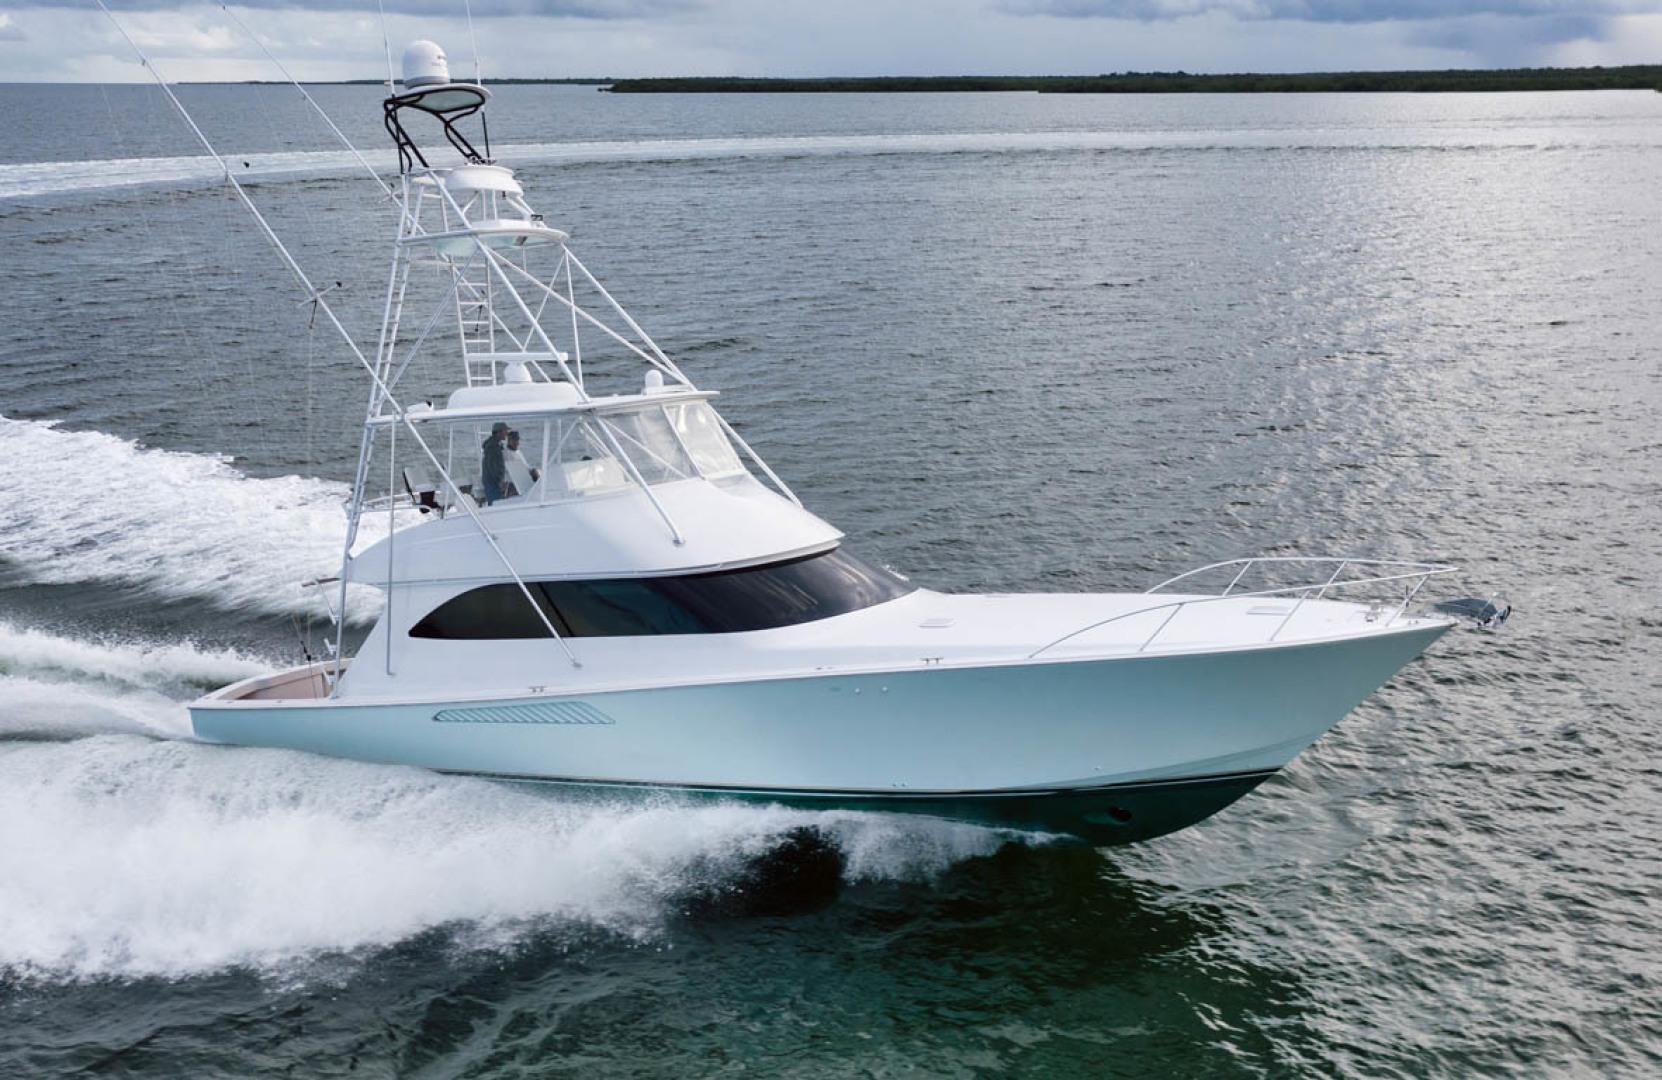 Viking-Convertible 2009-MOLLIE K Key Largo-Florida-United States-Main Profile-1487389 | Thumbnail